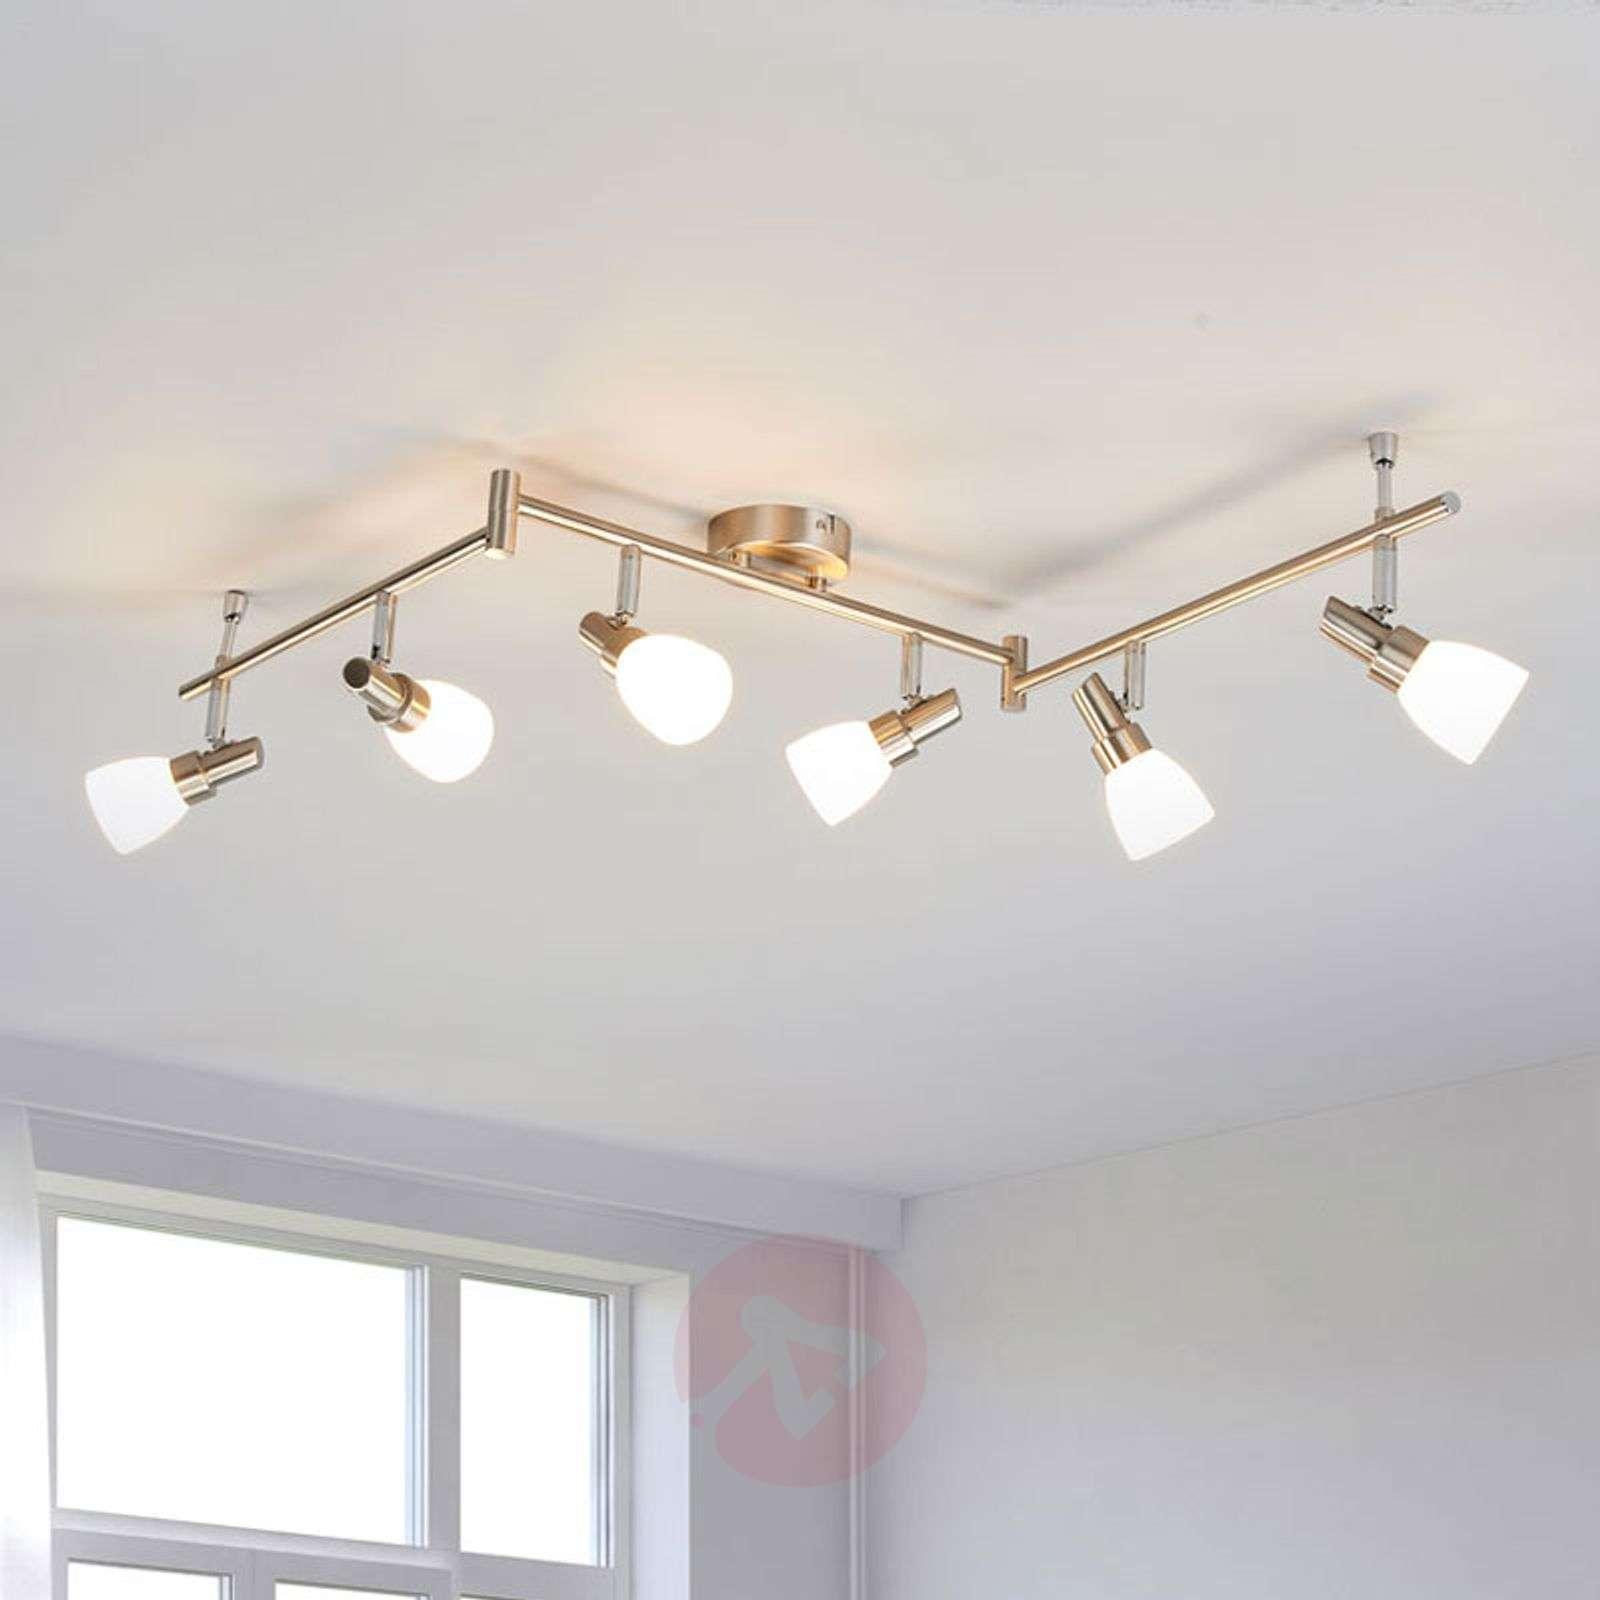 Bright LED Kitchen Light Vila G Dimmable Lightsie - Bright led kitchen ceiling light